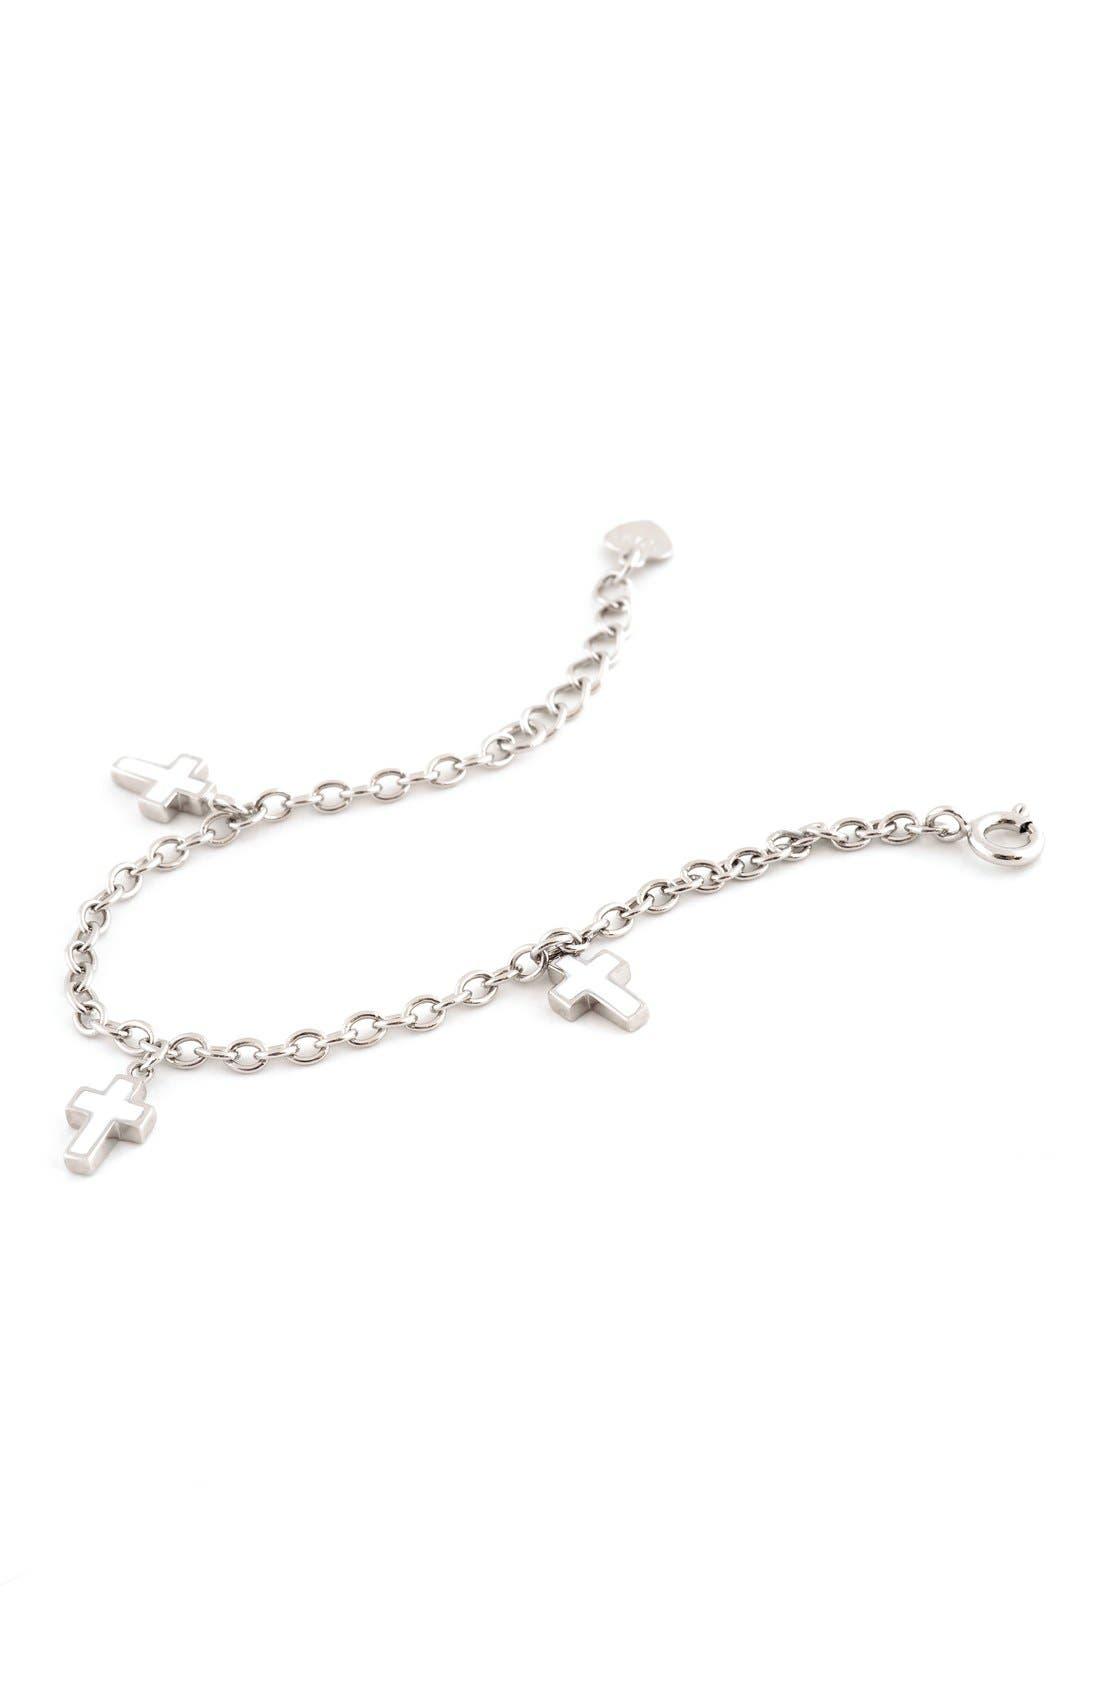 Enameled Cross Sterling Silver Charm Bracelet,                         Main,                         color, NONE